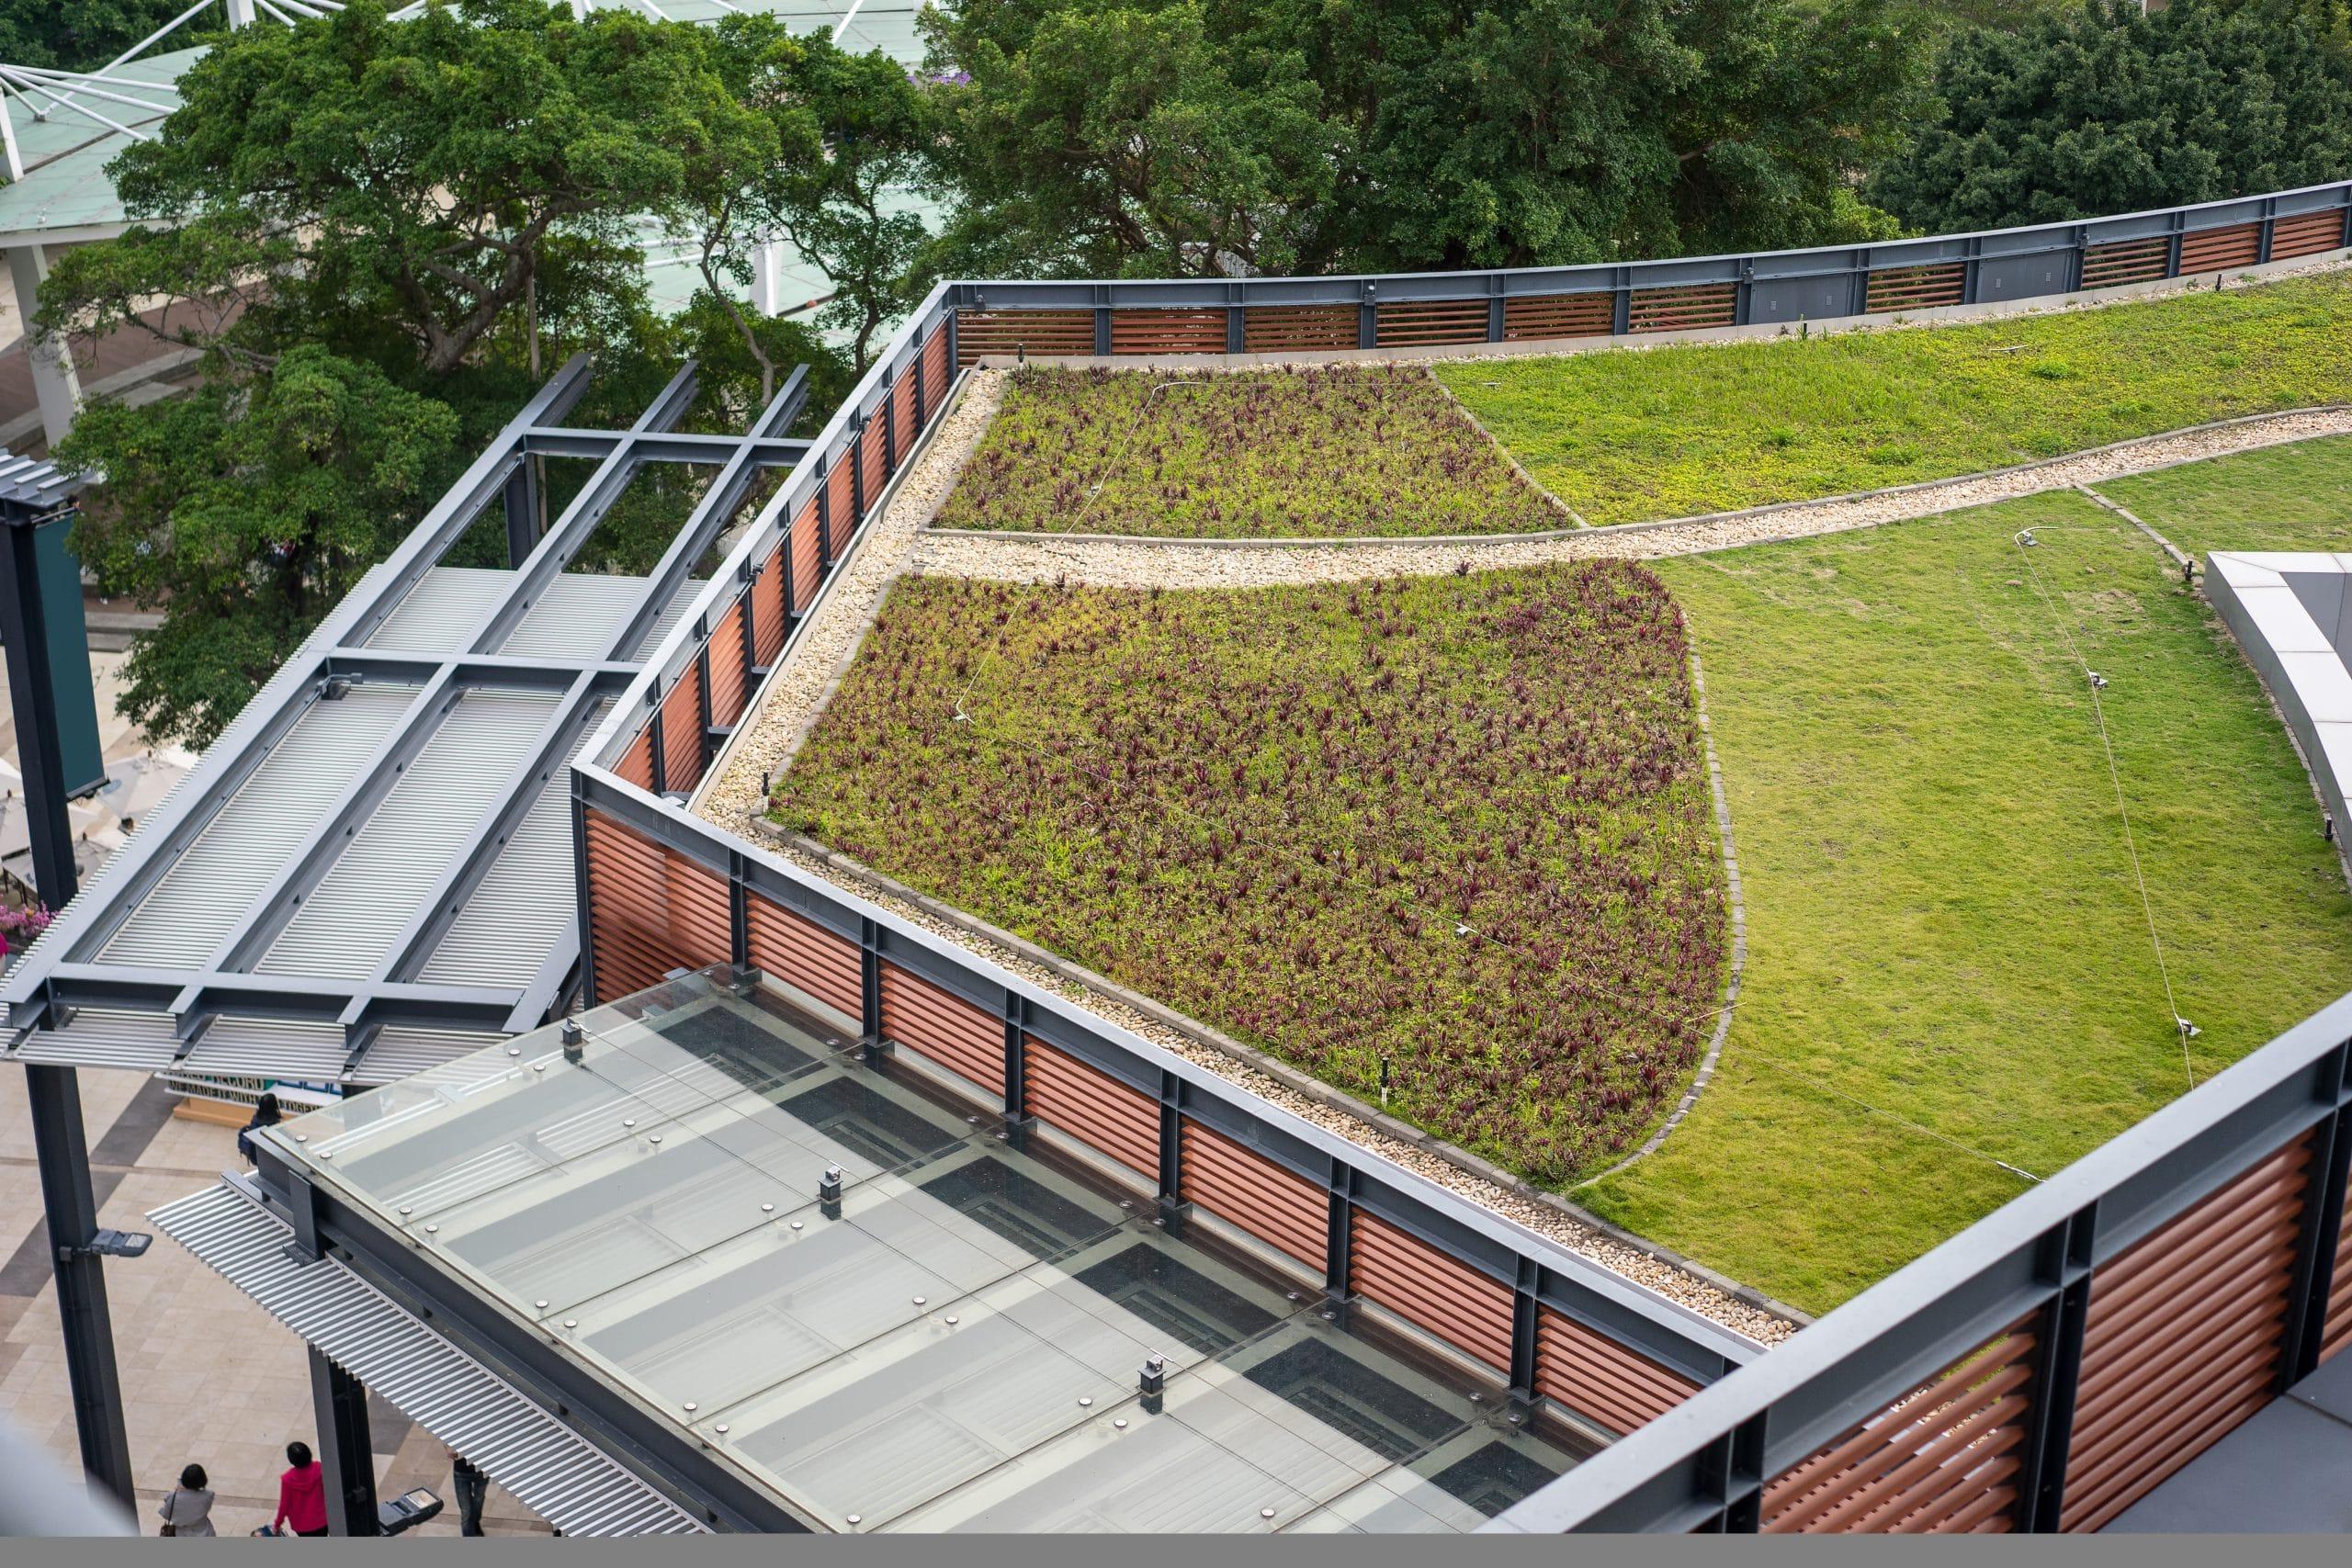 The Urban Greening Factor